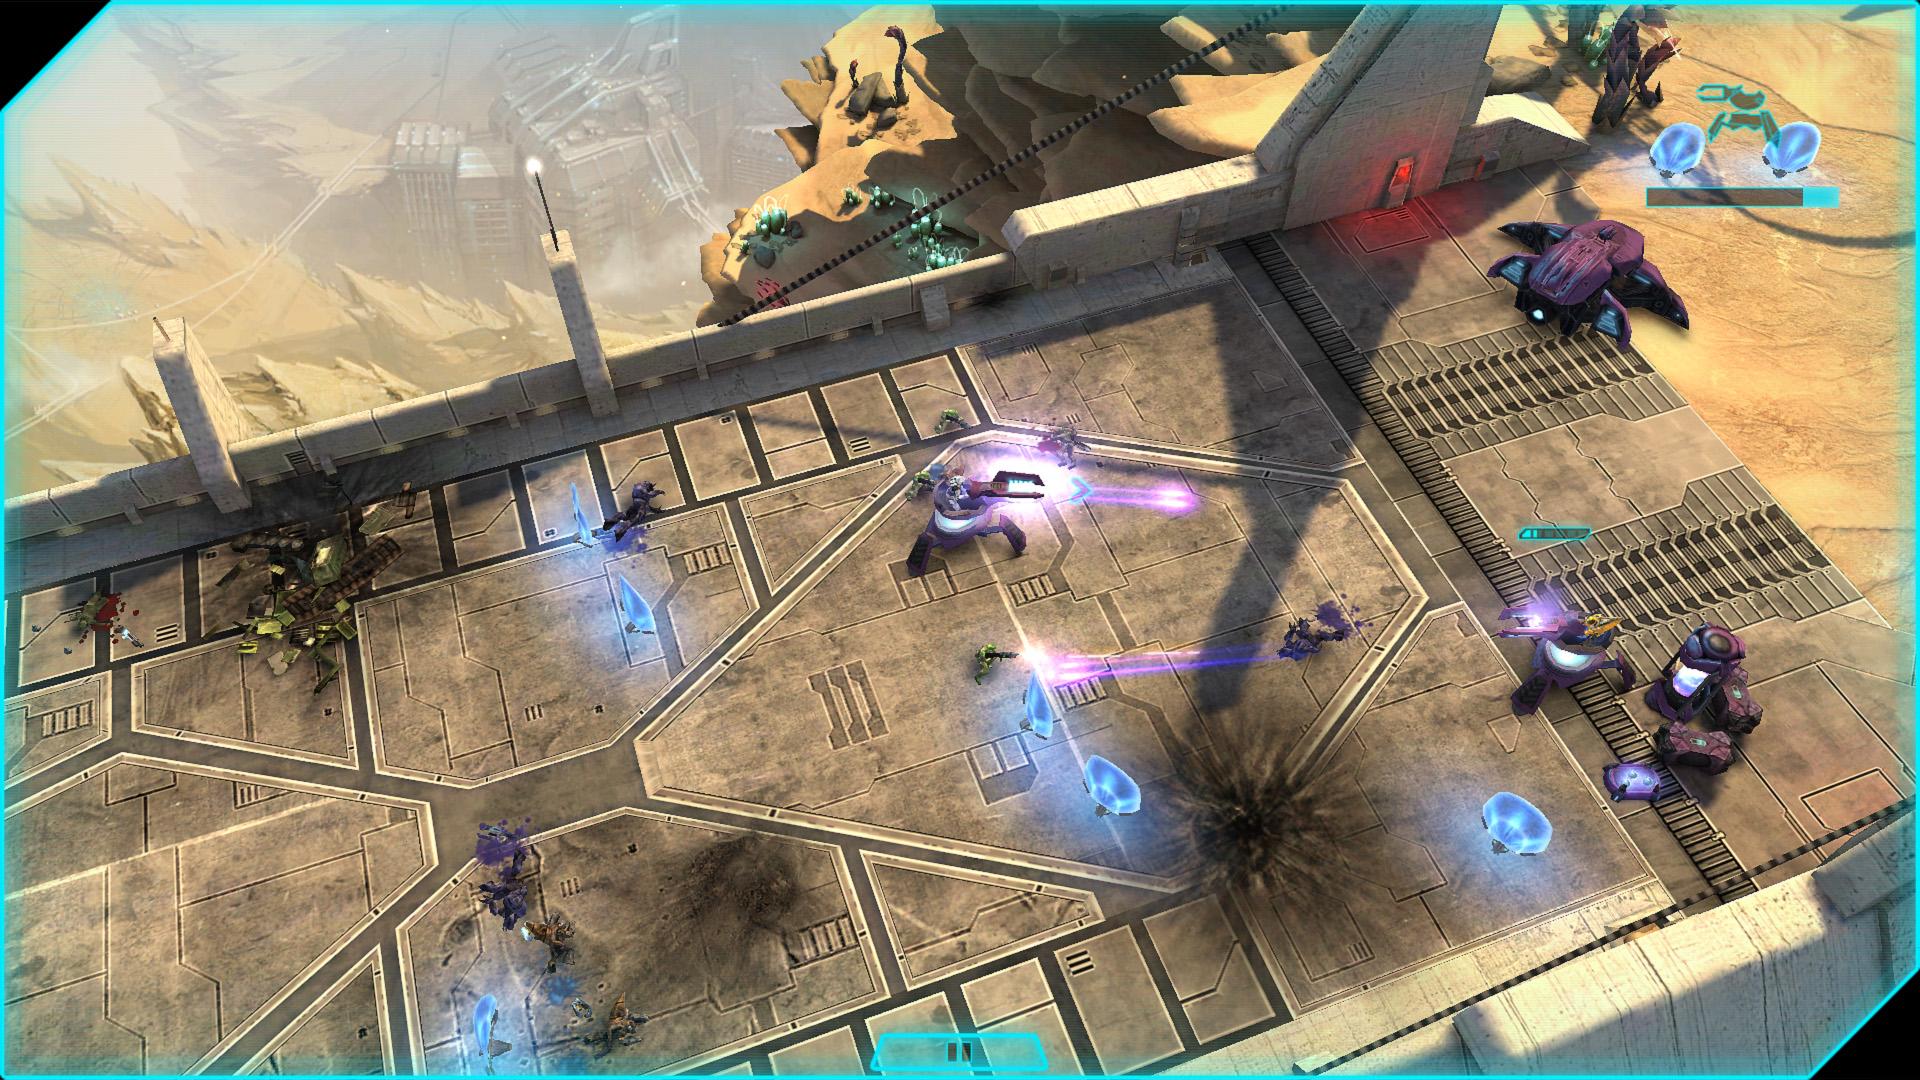 0005-1370353014-halo-spartan-assault-screenshot-bridge-blockade